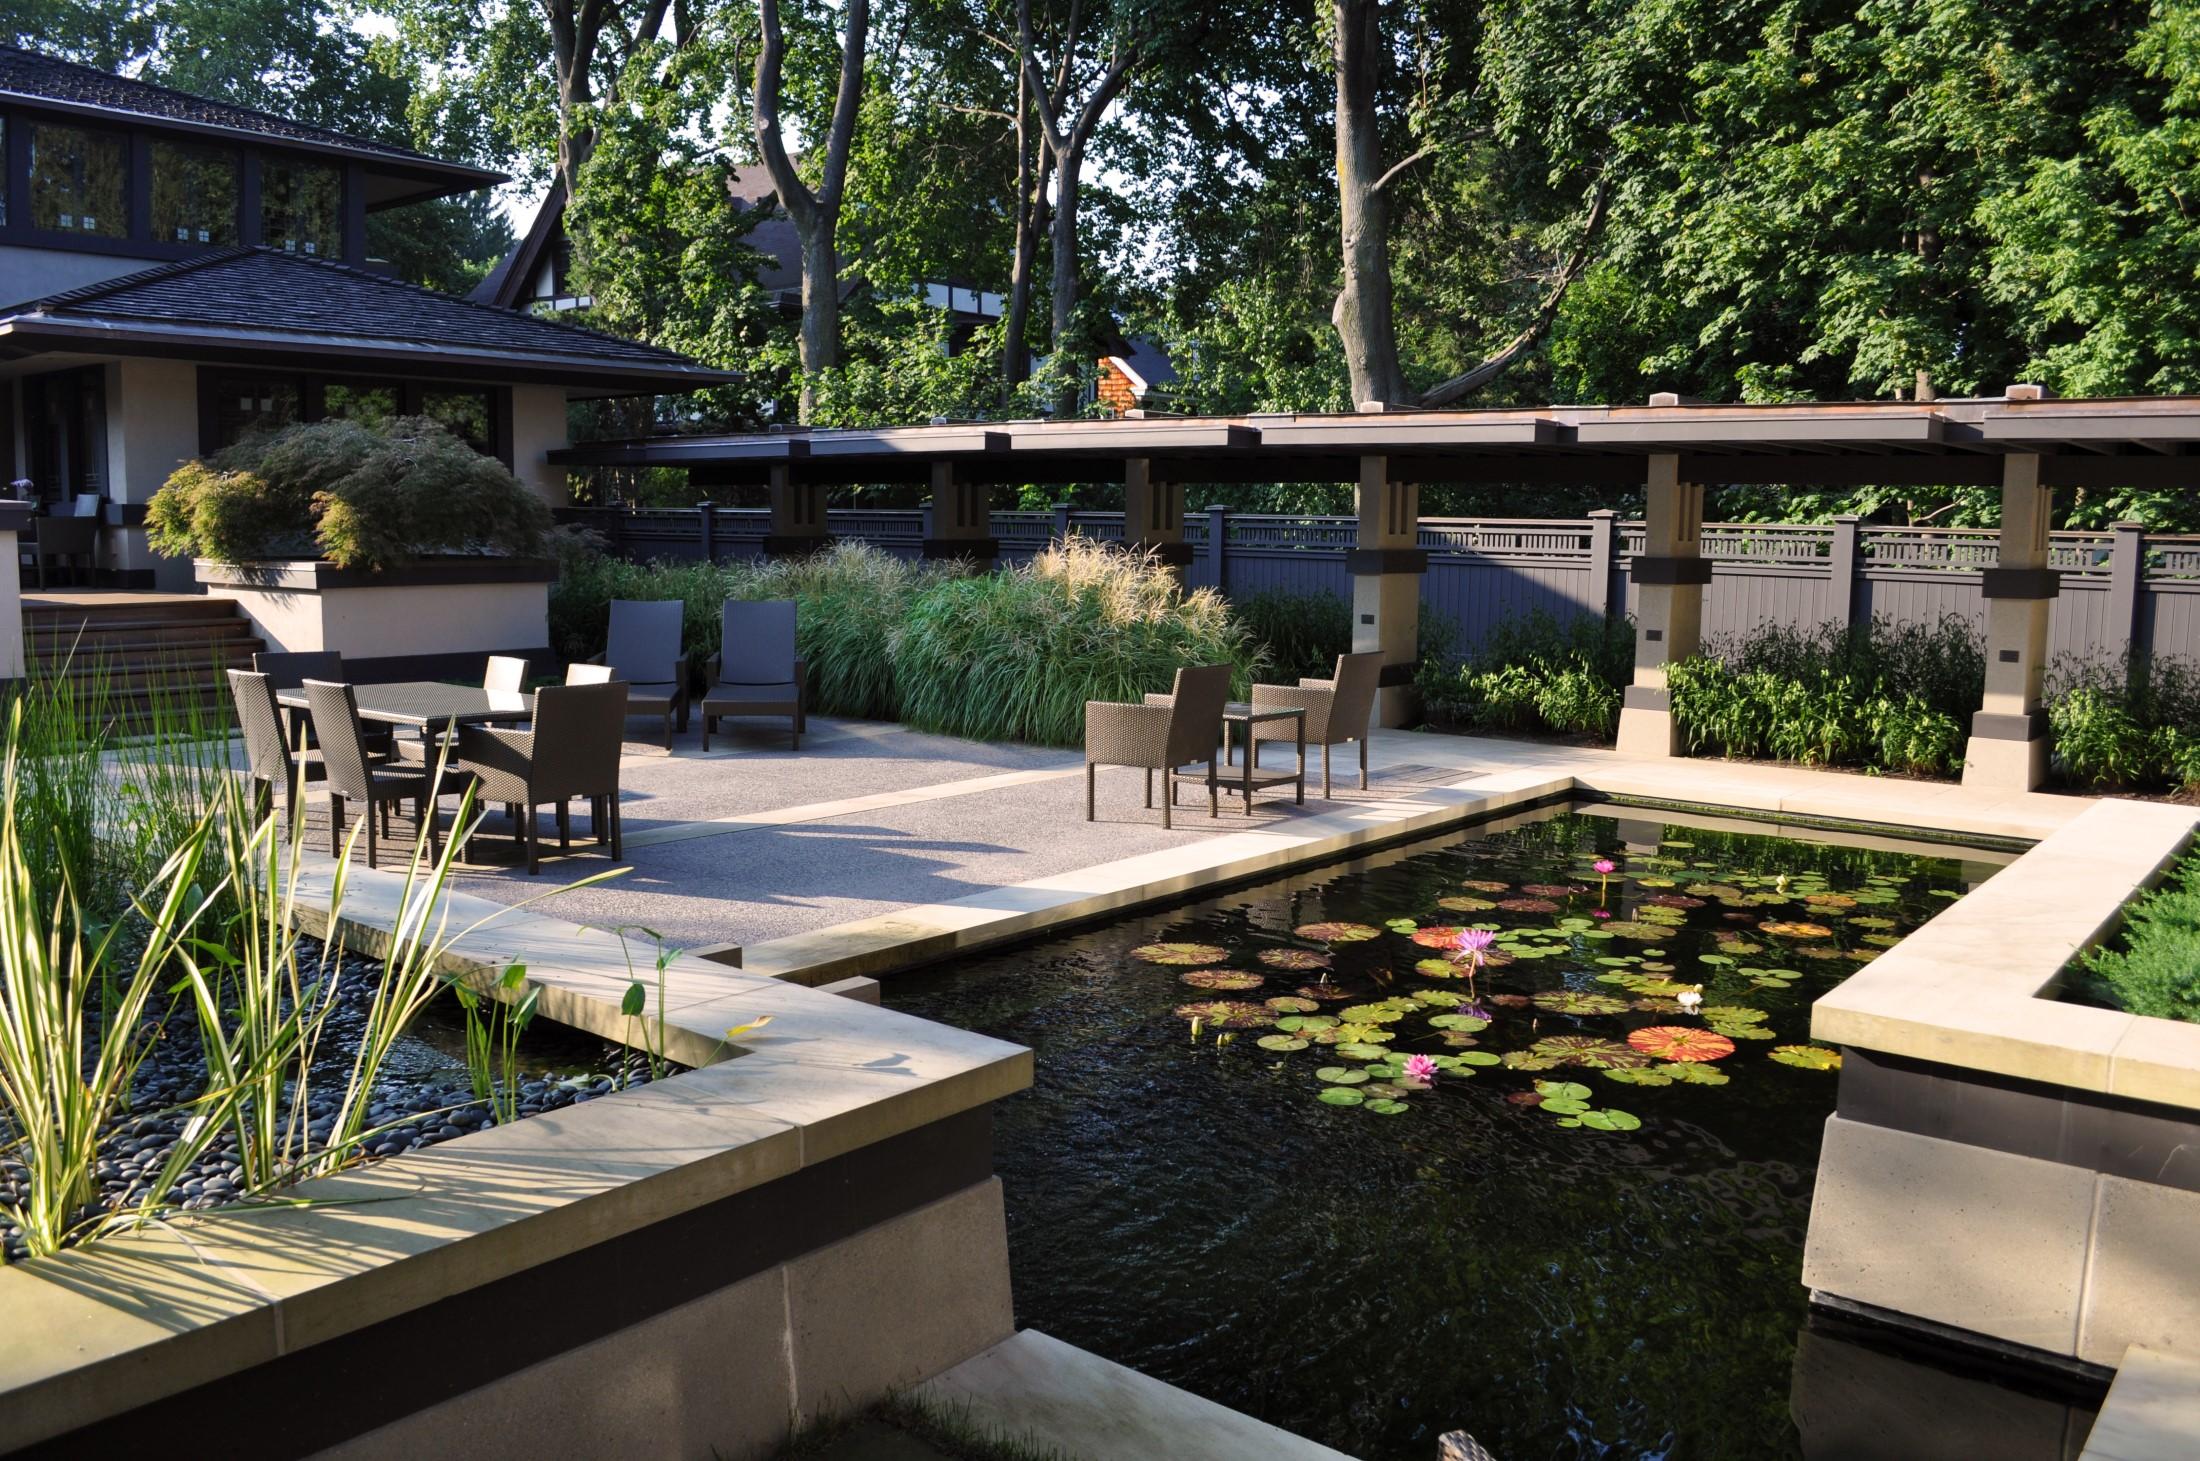 Frank Lloyd Wright's Boynton House   2014 AIA Rochester Award for Design Excellence  2013 NUY-ASLA Merit award, Historic Preservation